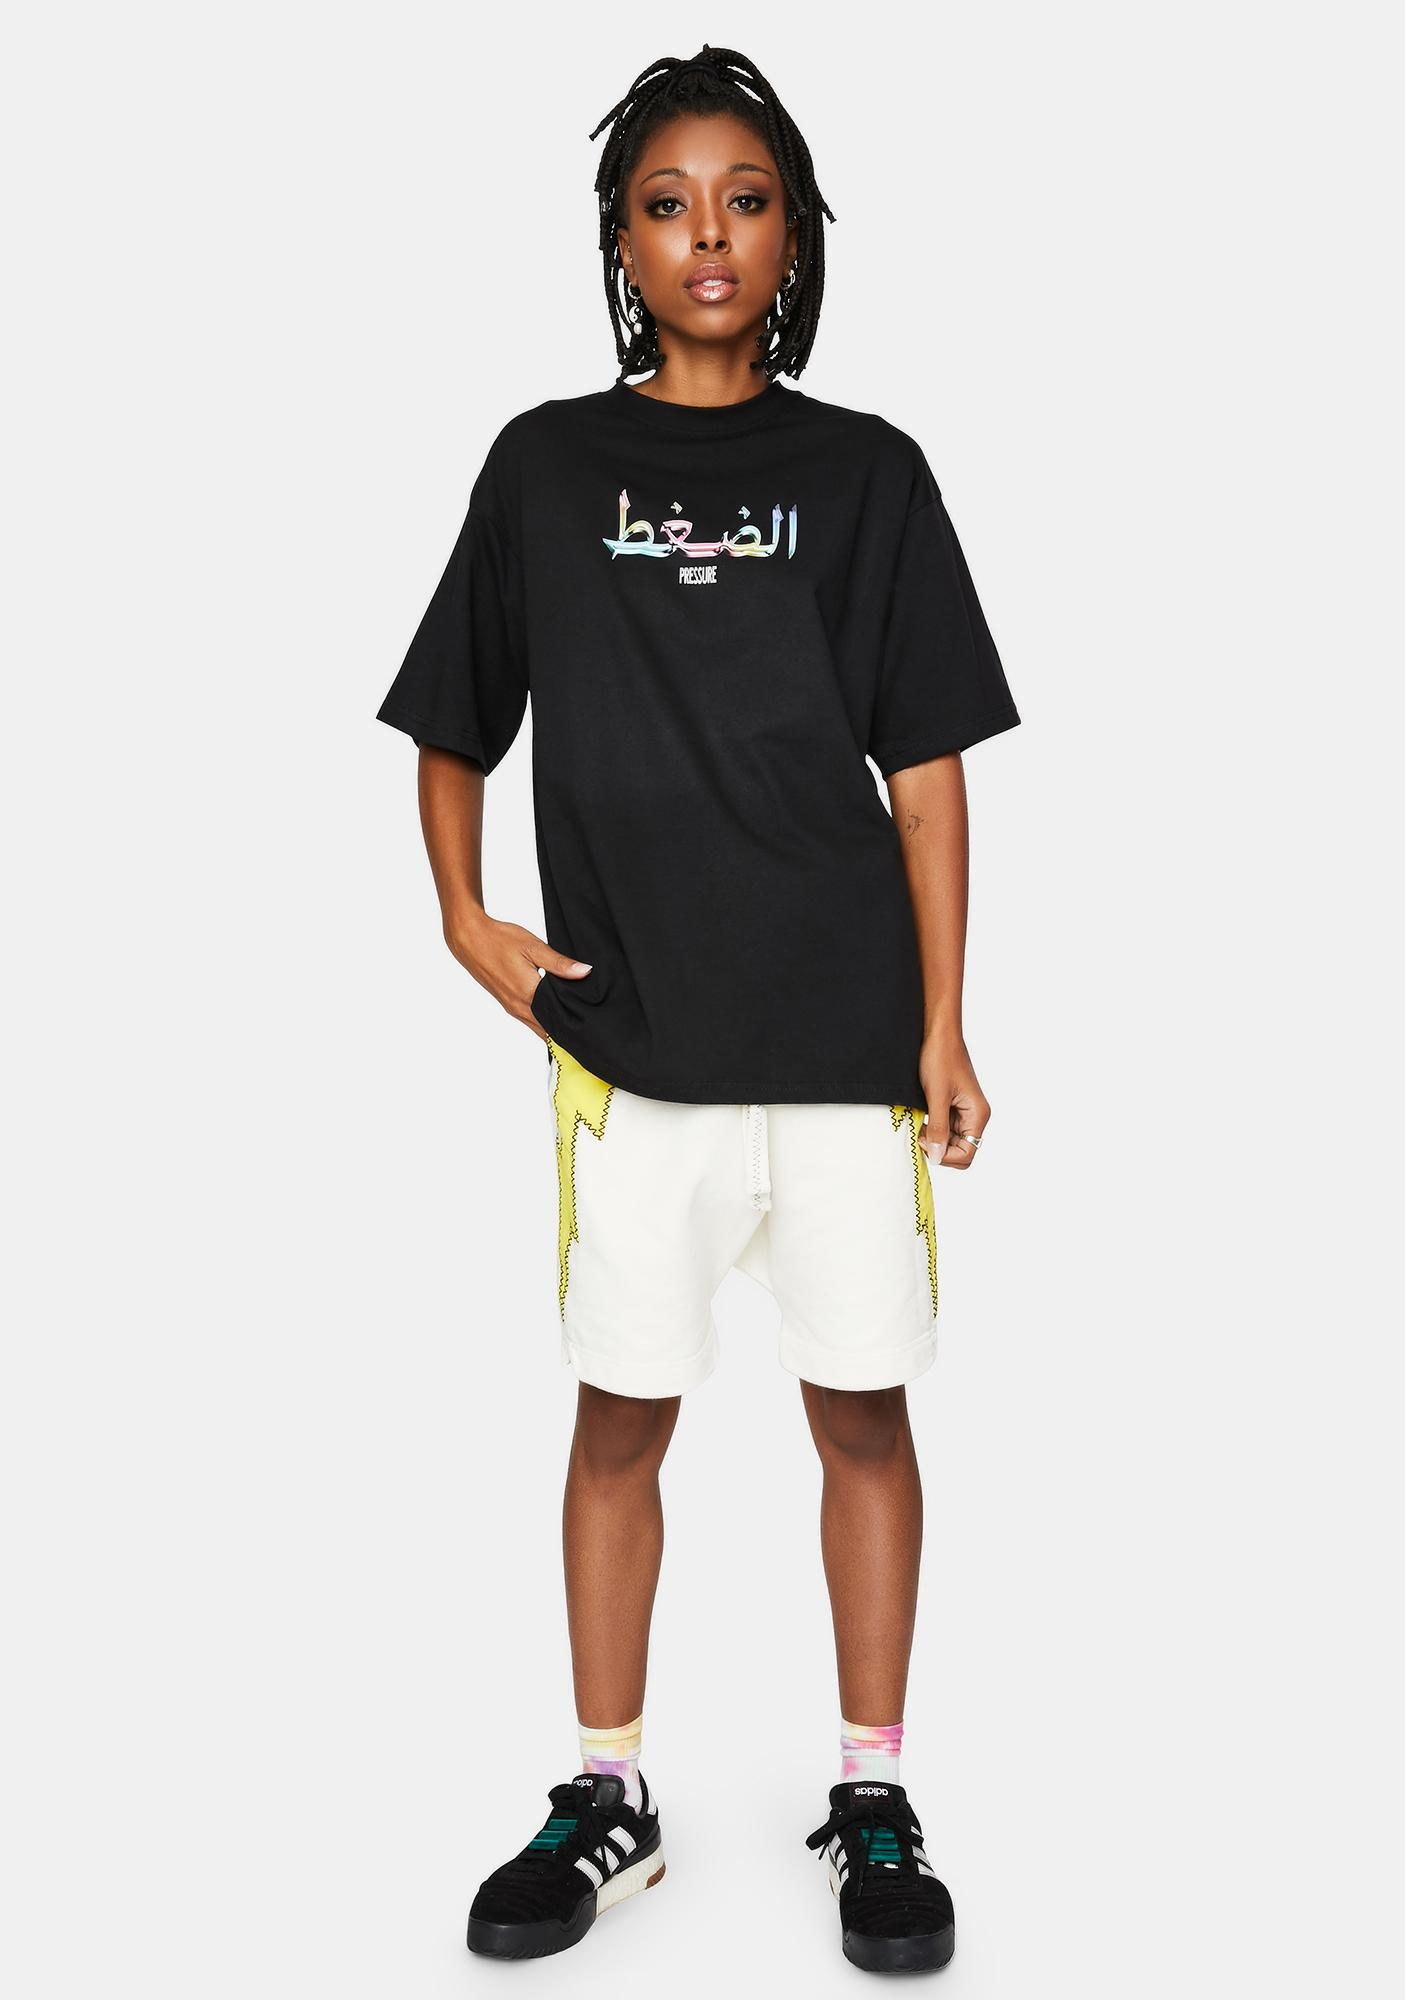 Pressure Clothes Black Arabic 3D Graphic Tee